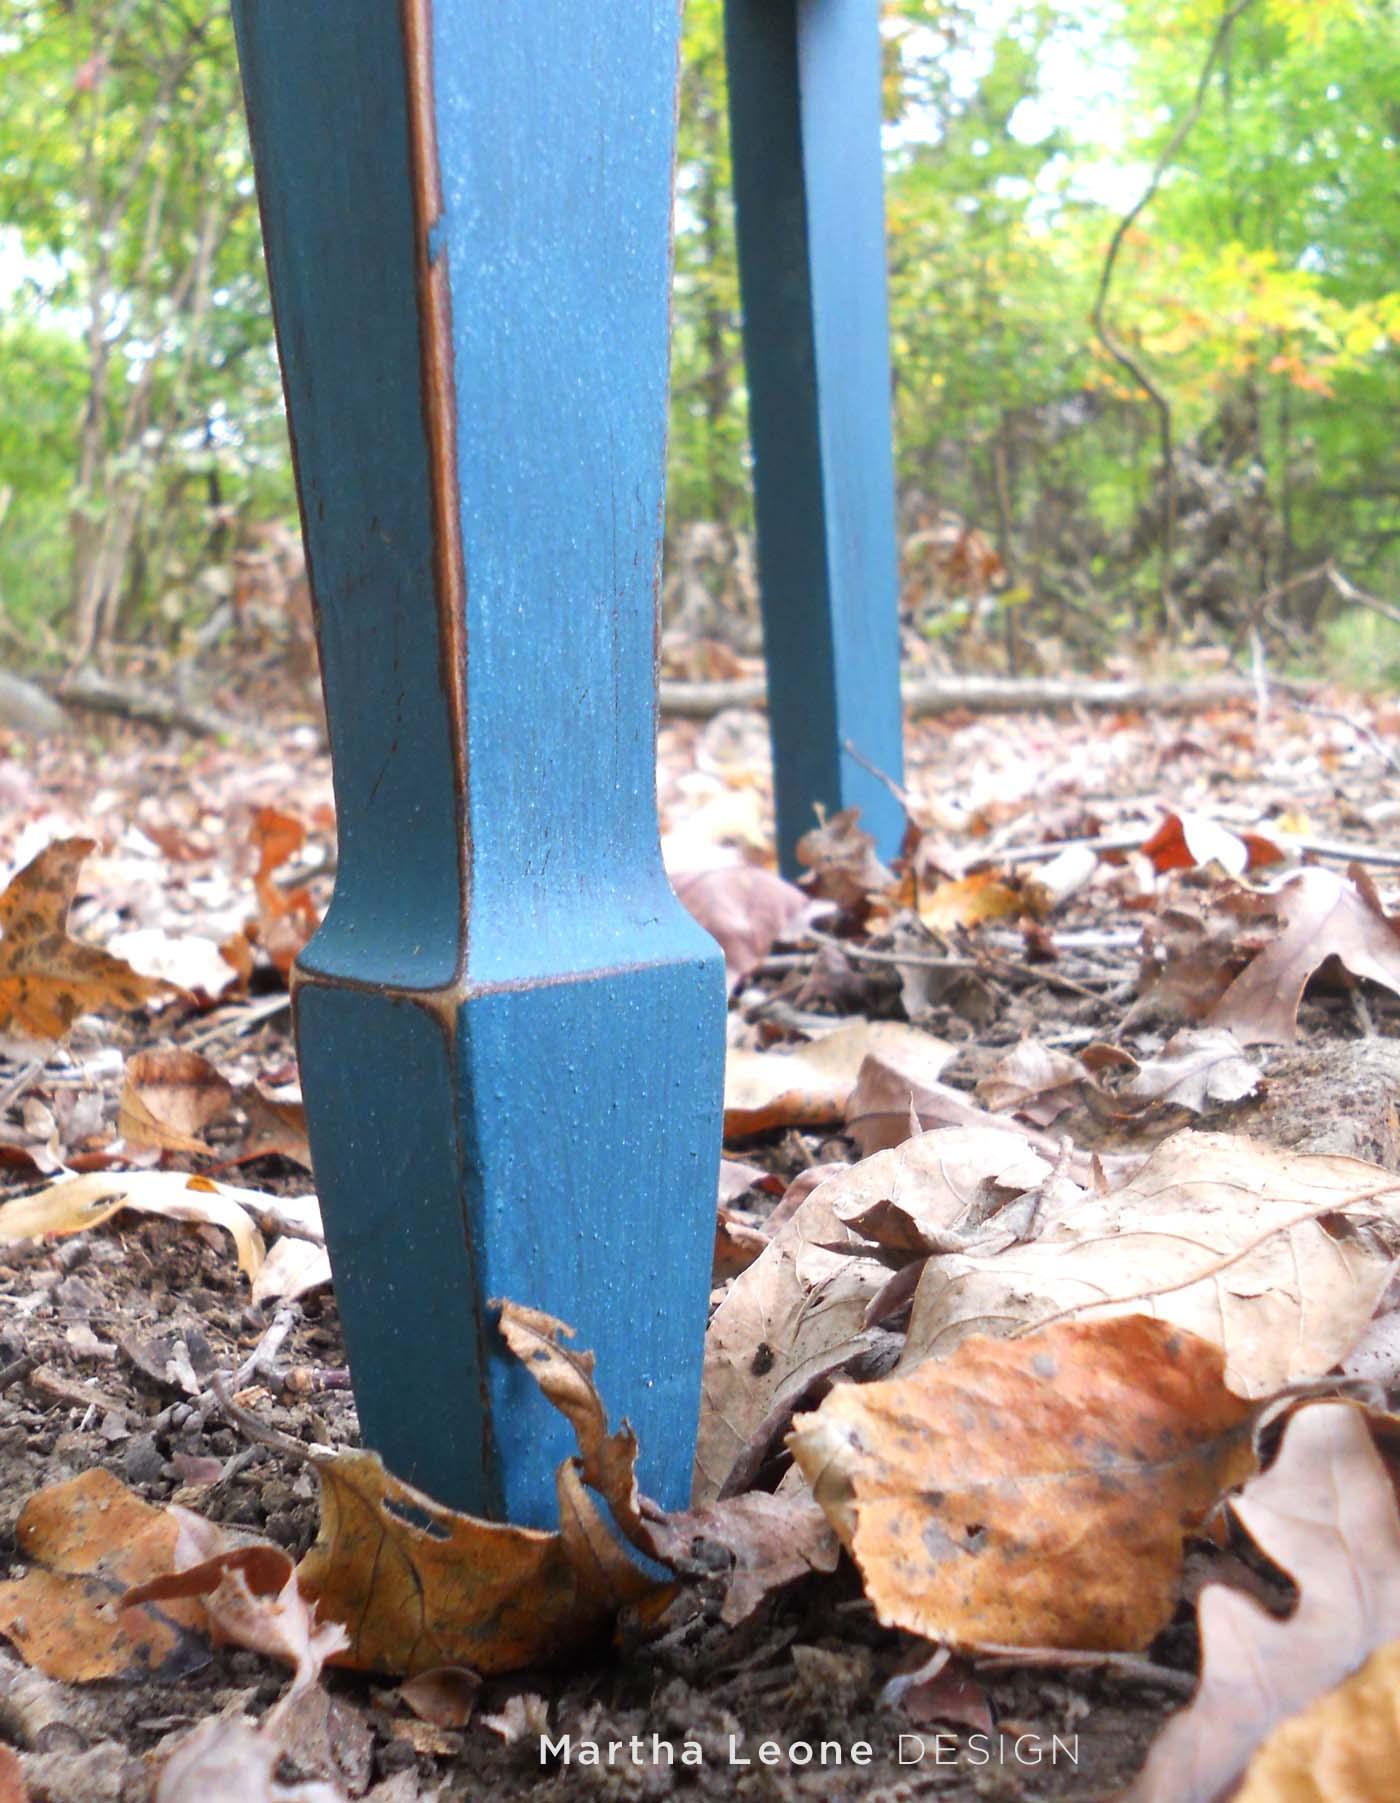 Blue with hepplewhite 10 at MarthaLeoneDesign